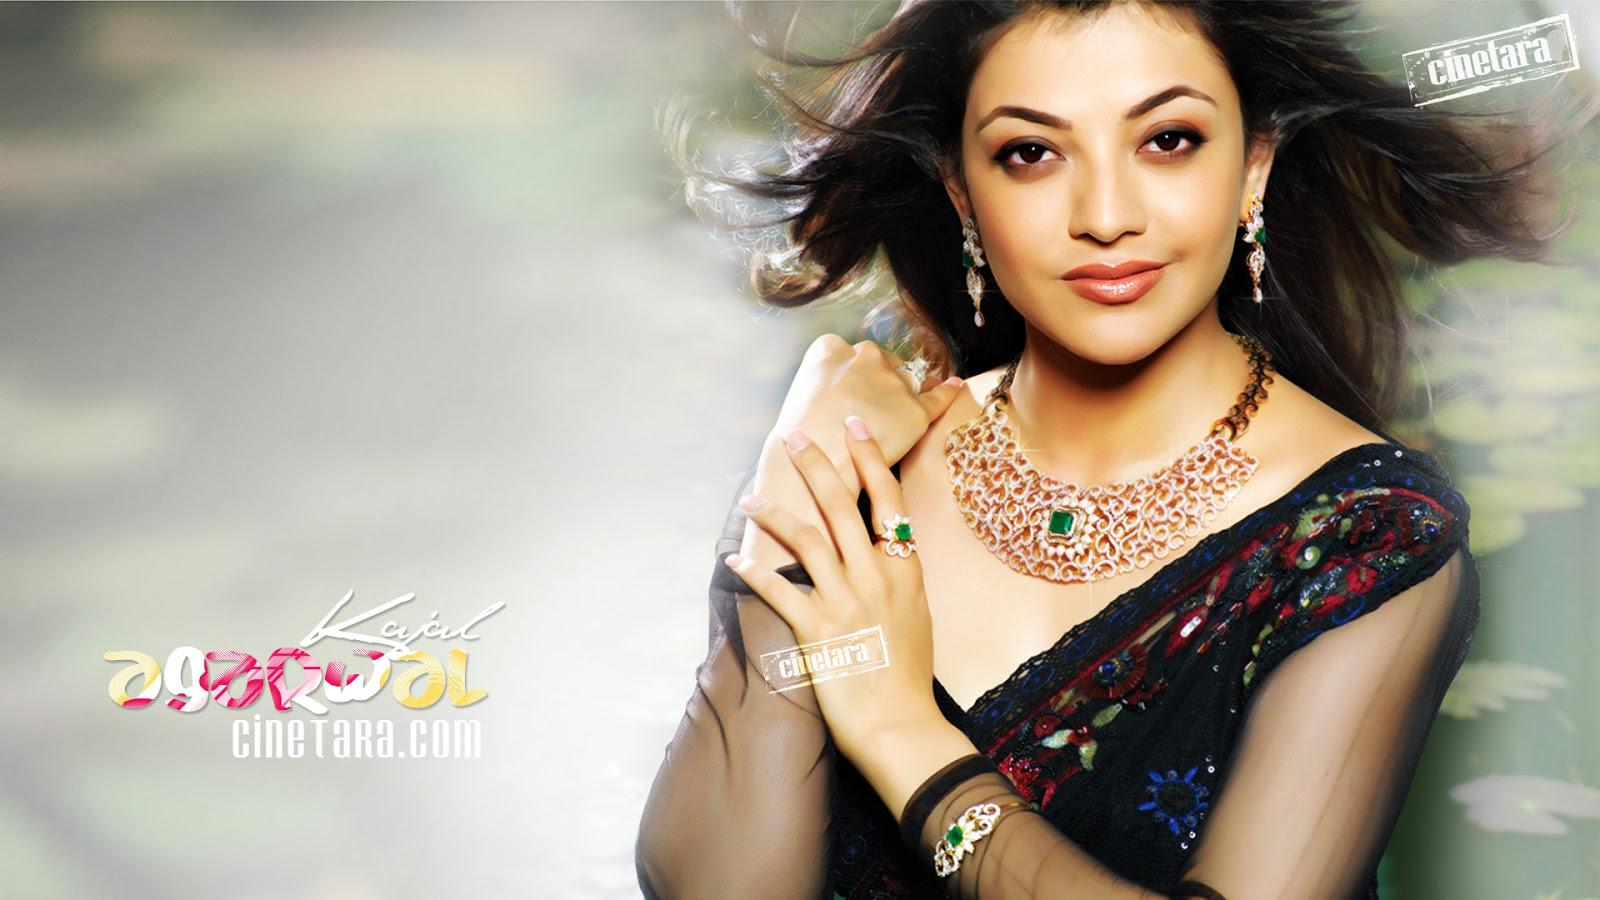 Telugu Actors Hd Wallpapers 53 Wallpapers: Telugu Actress HQ Desktop Wallpapers